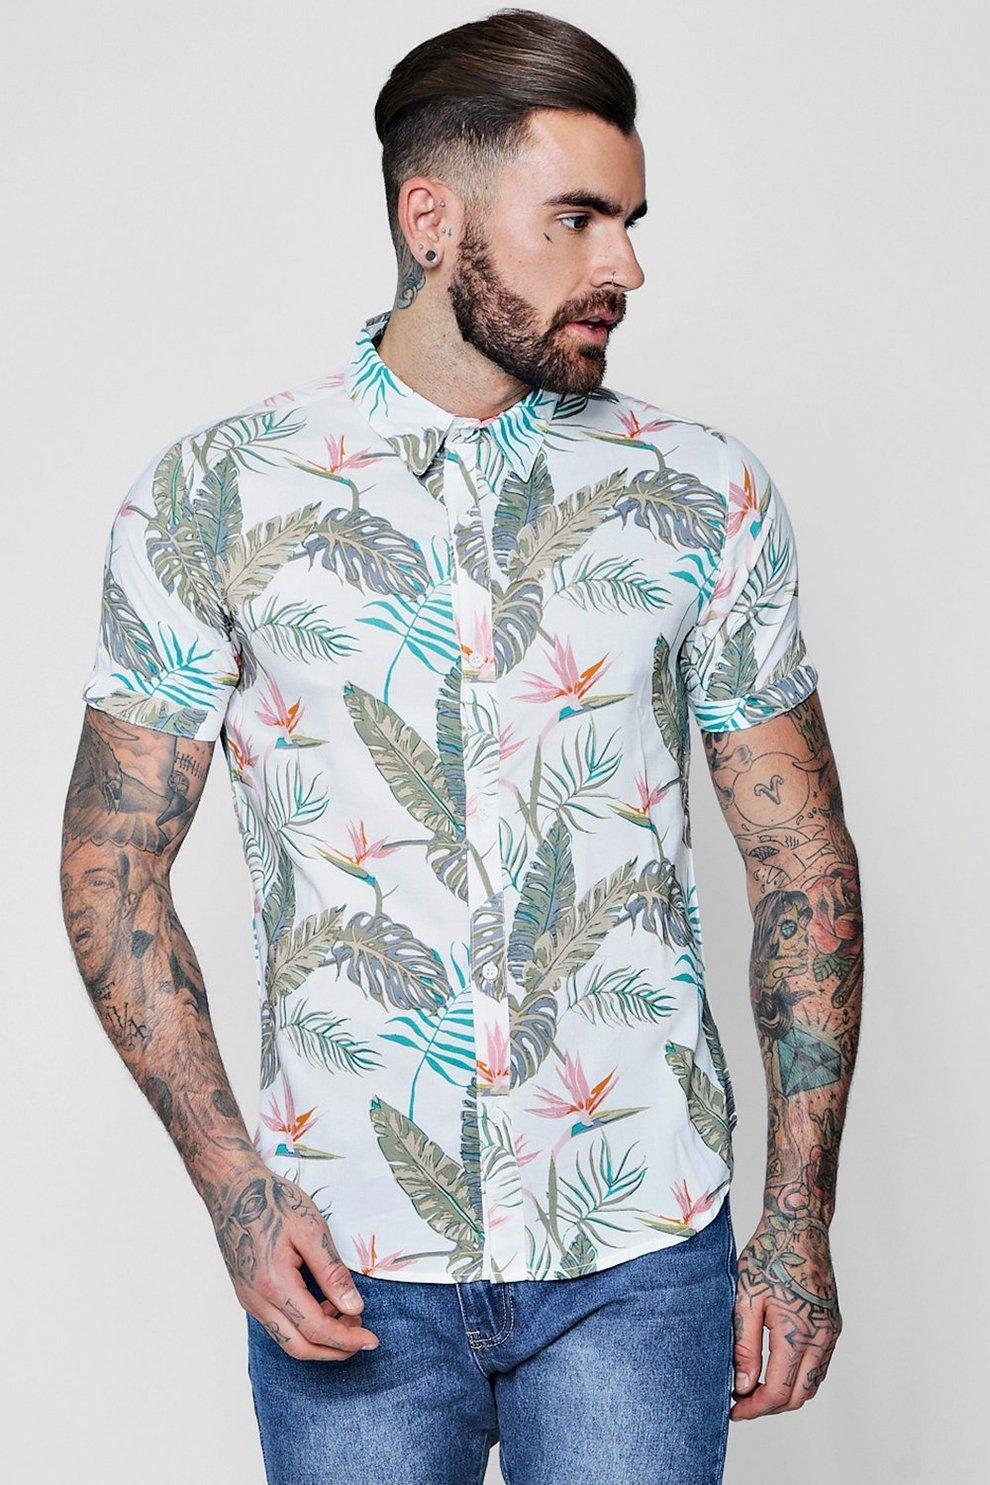 cd8fffe0 Tropical Floral Print Short Sleeve Shirt - boohooMAN